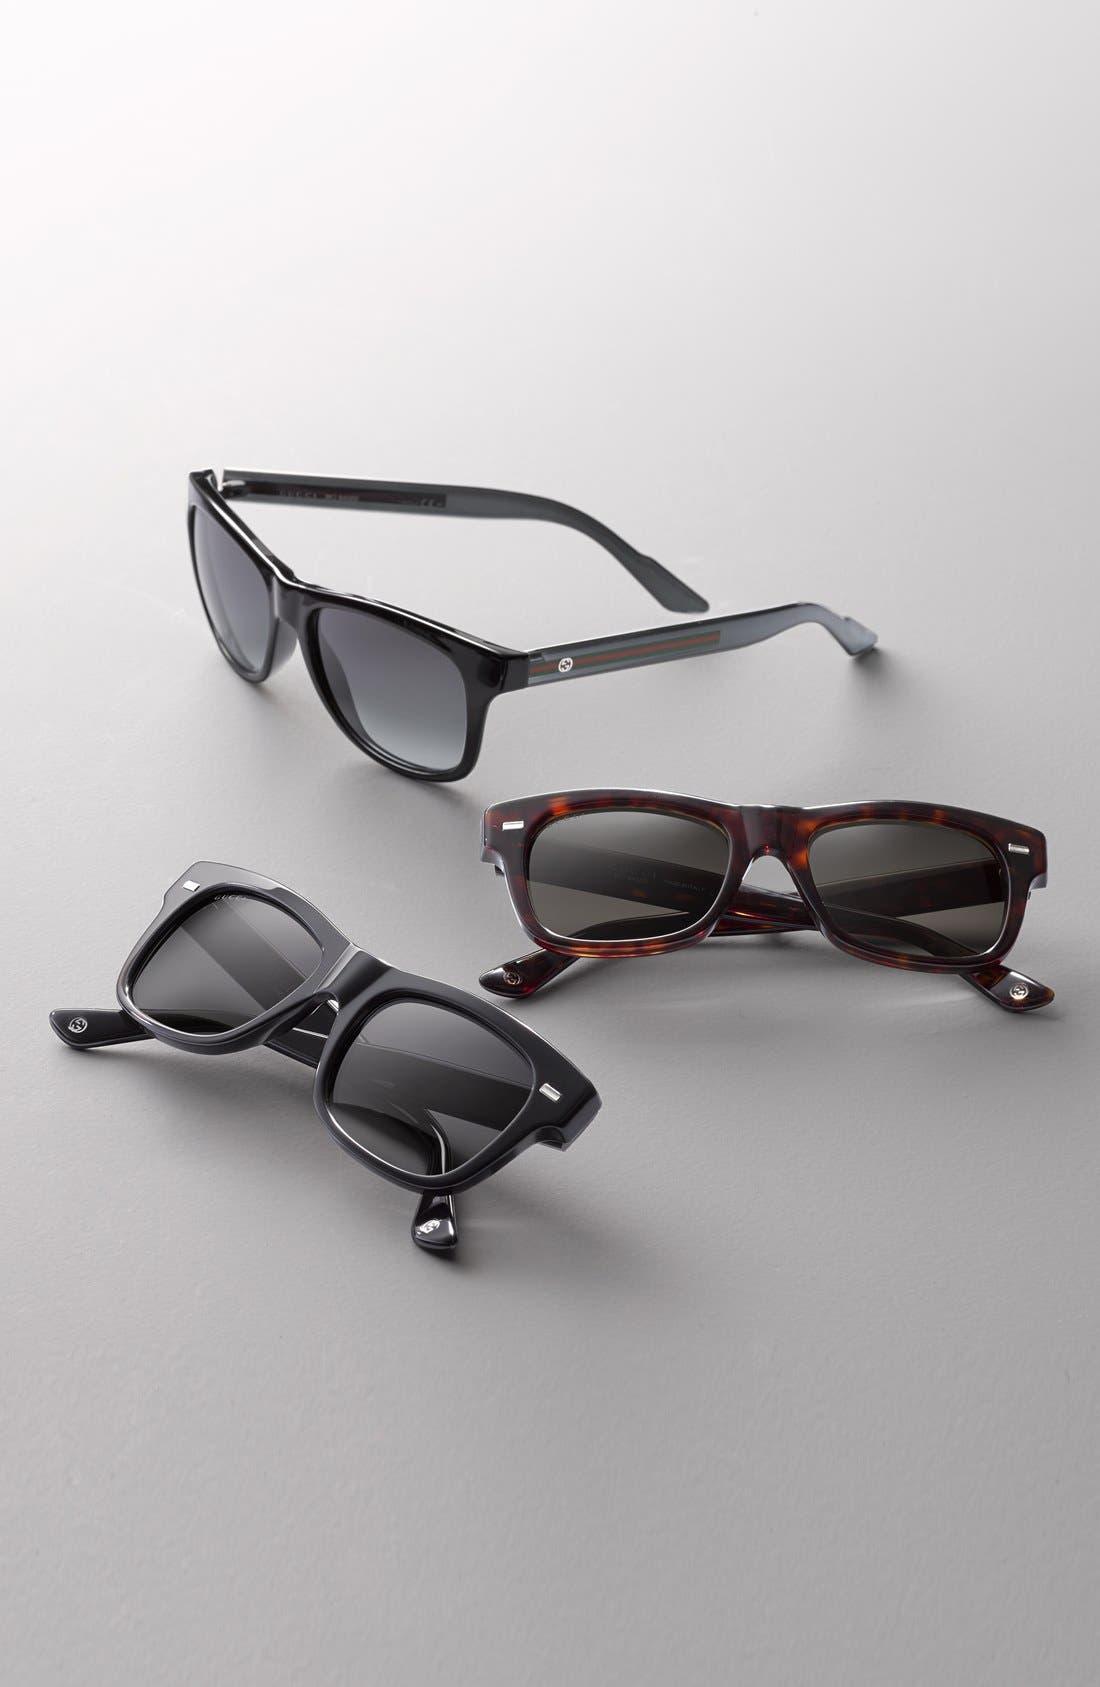 57mm Bio Based Sunglasses, Main, color, 001